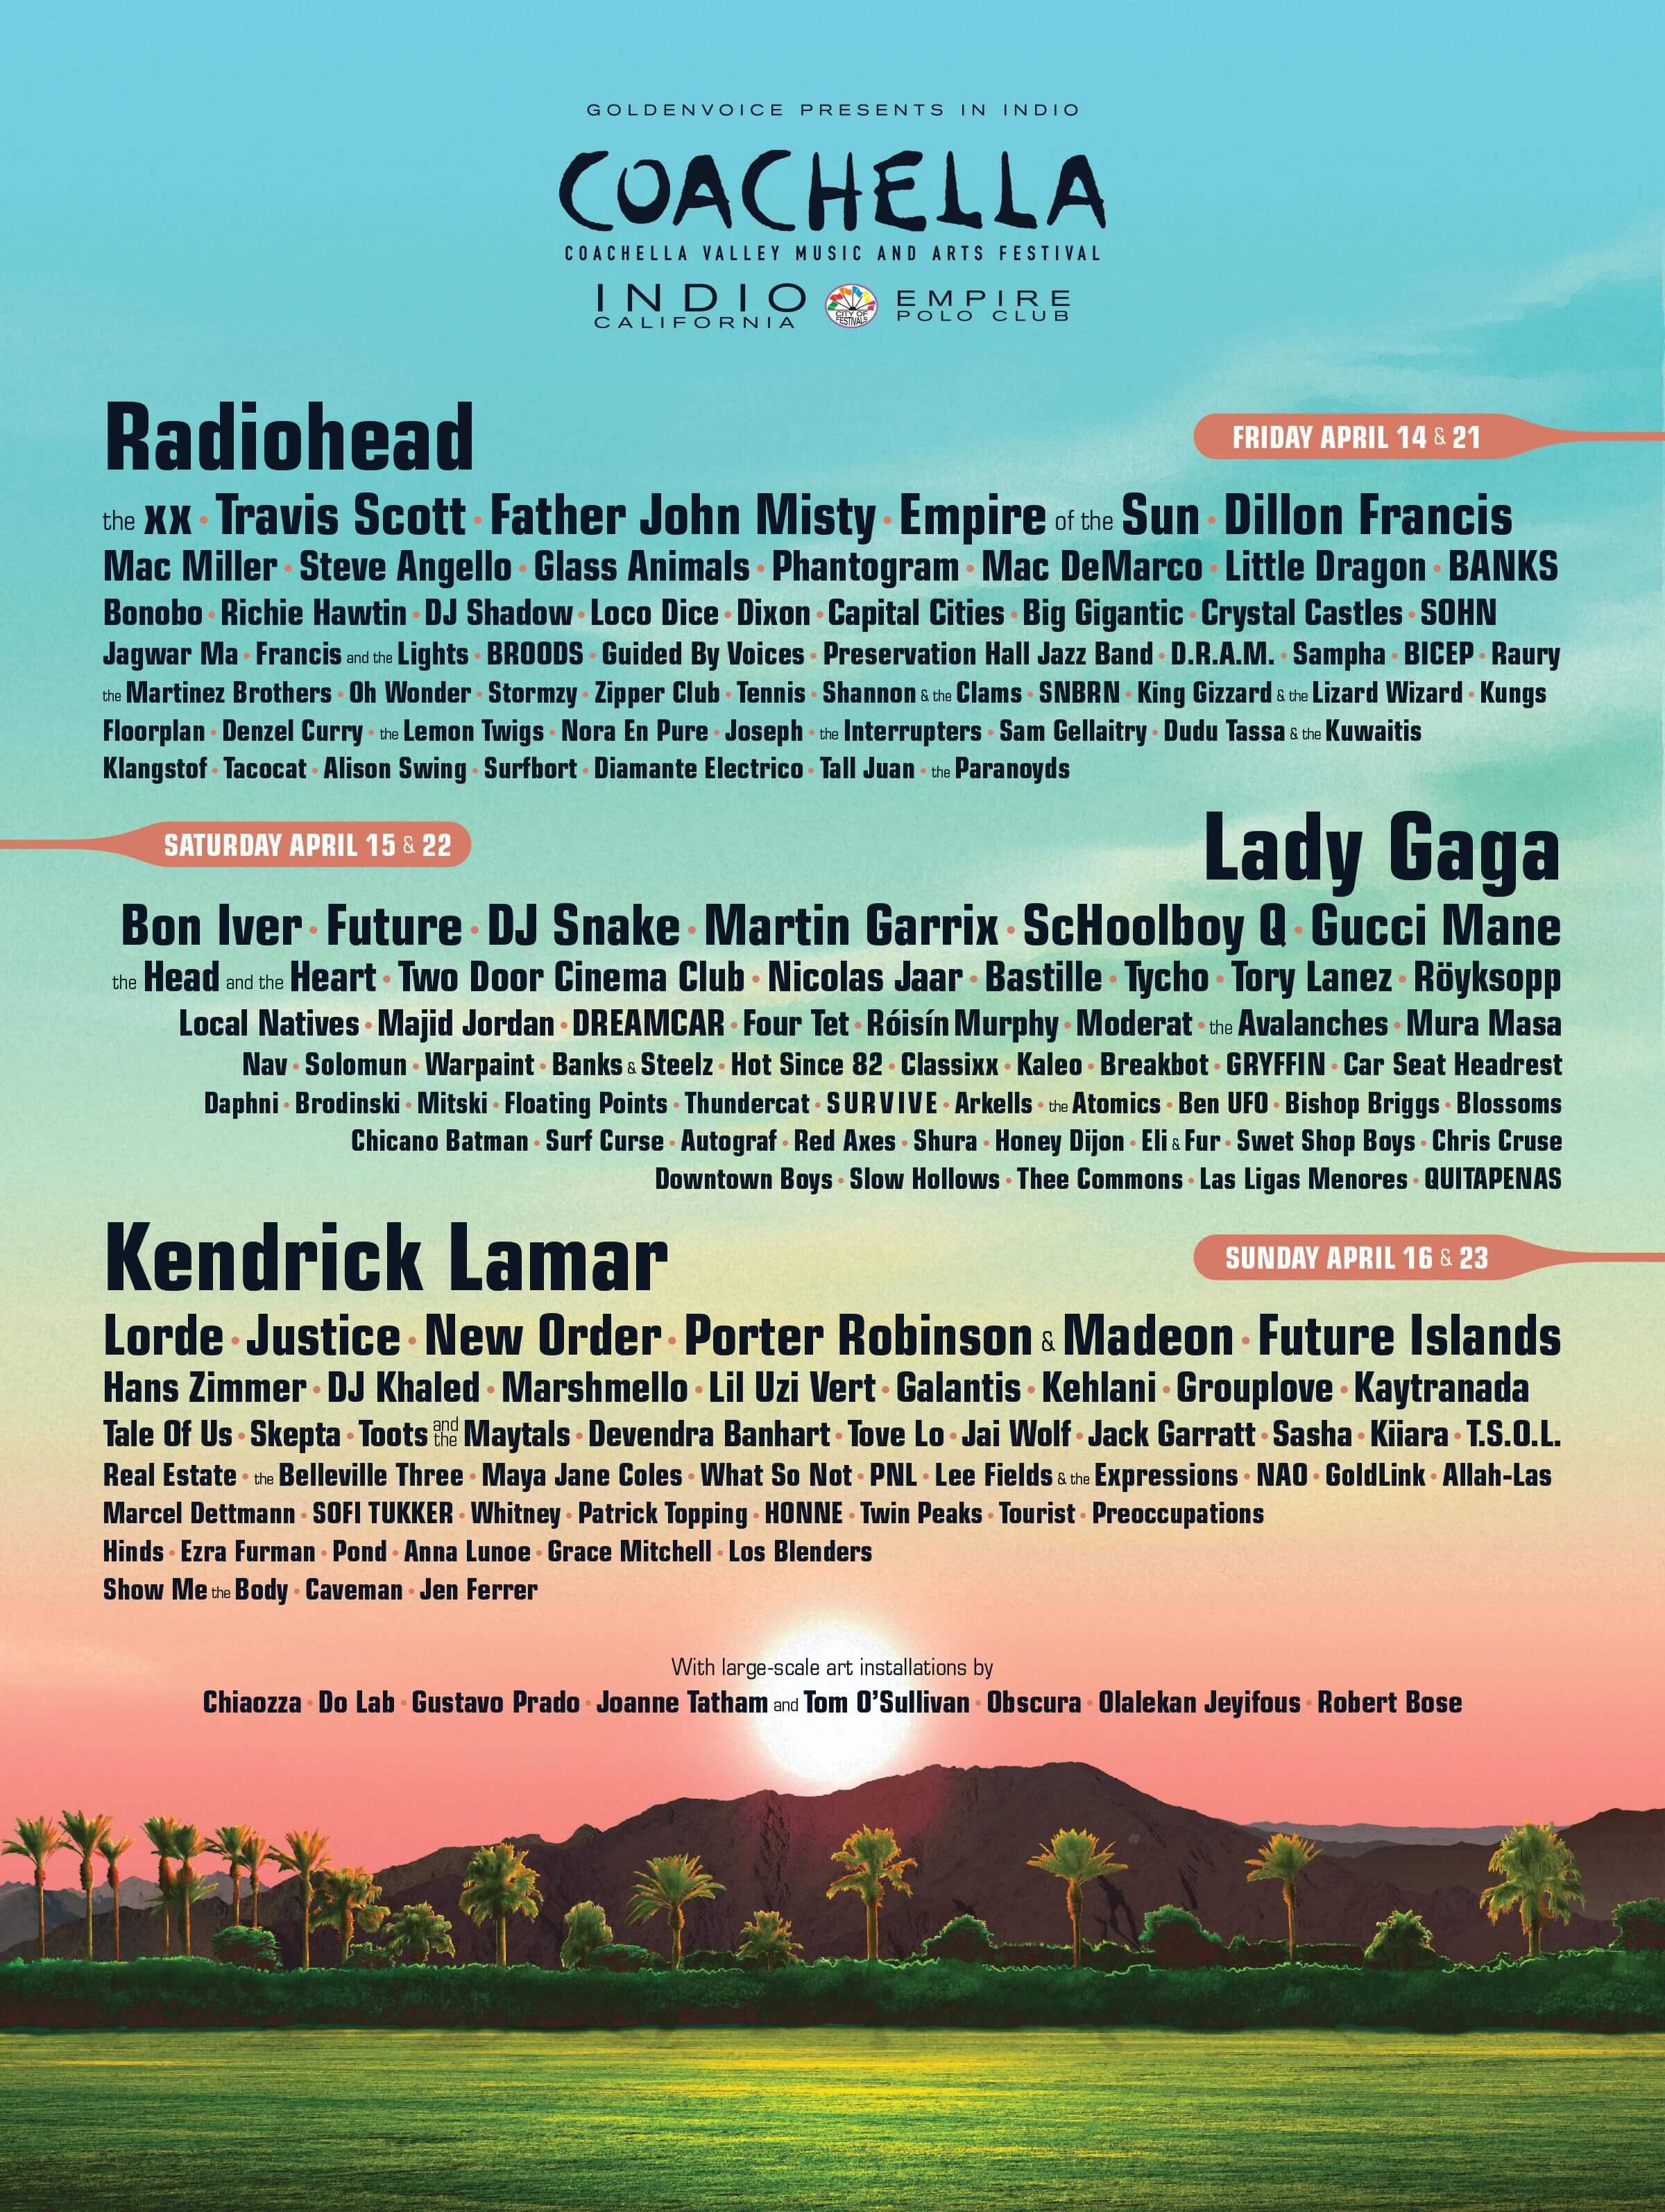 Coachella 2017 Lineup Poster